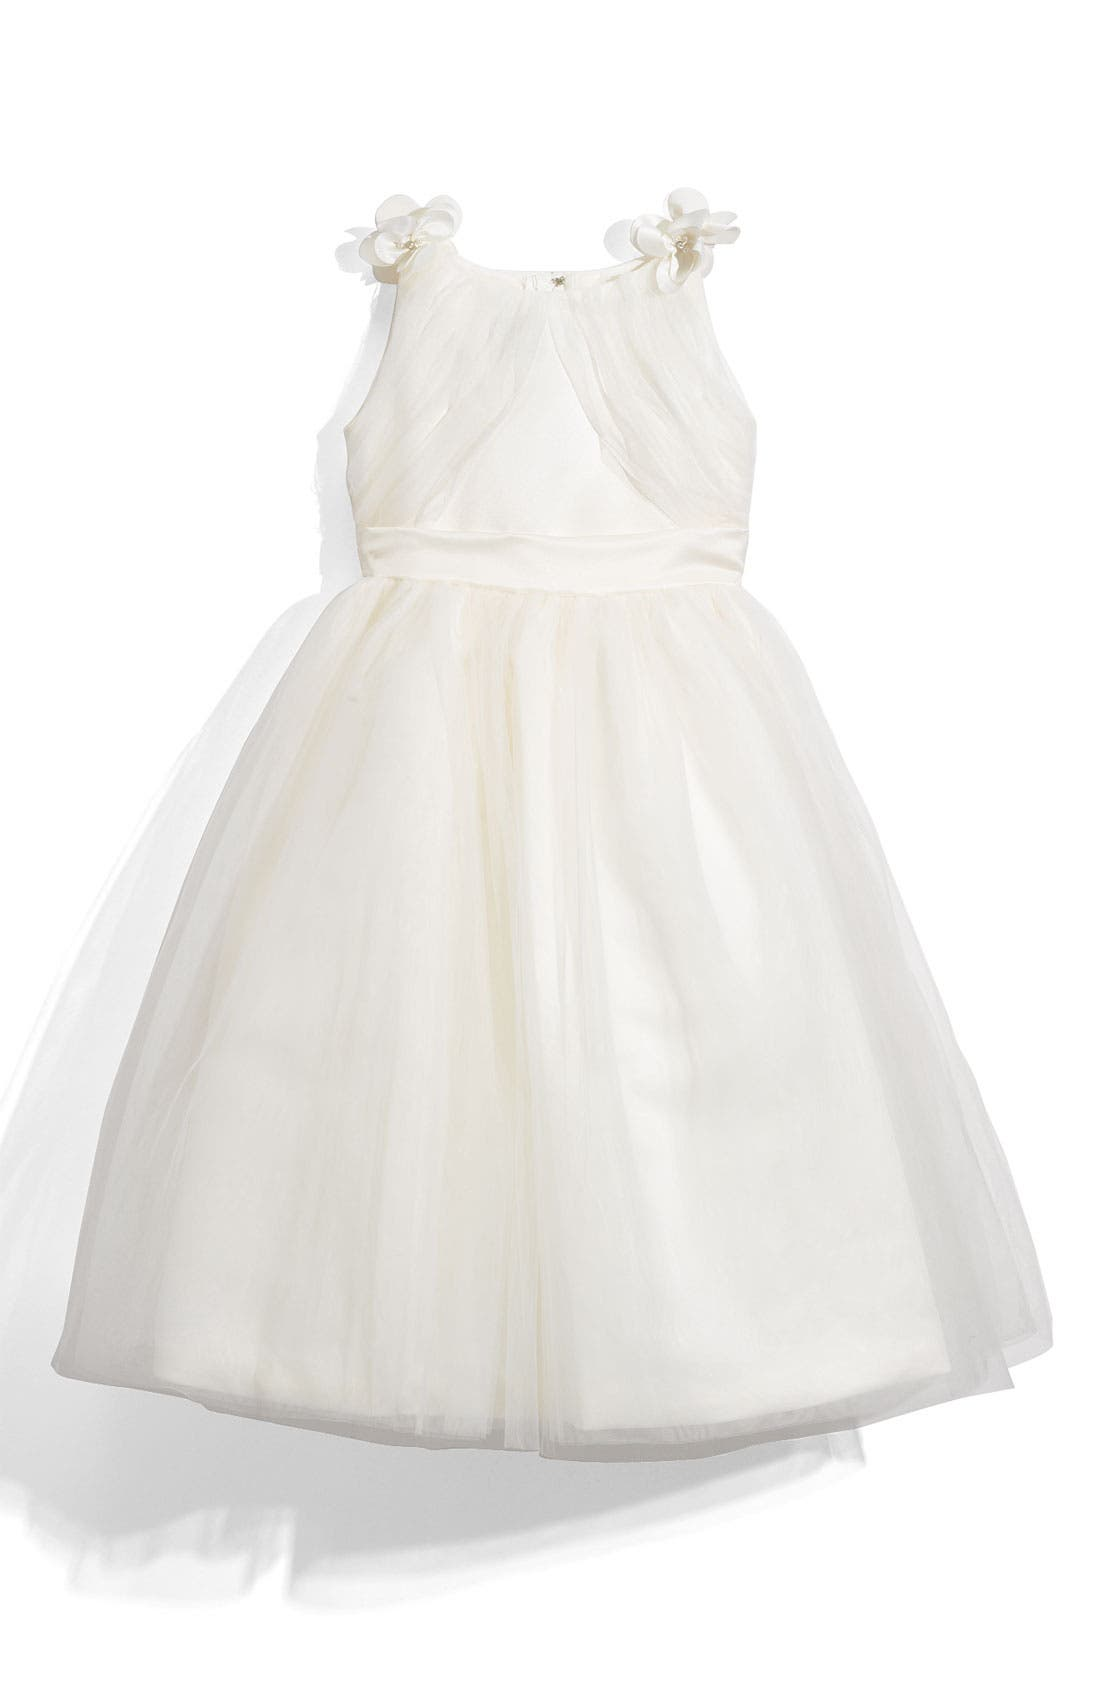 Alternate Image 1 Selected - Joan Calabrese for Mon Cheri 'Illusion' Sleeveless Satin Dress (Little Girls & Big Girls)